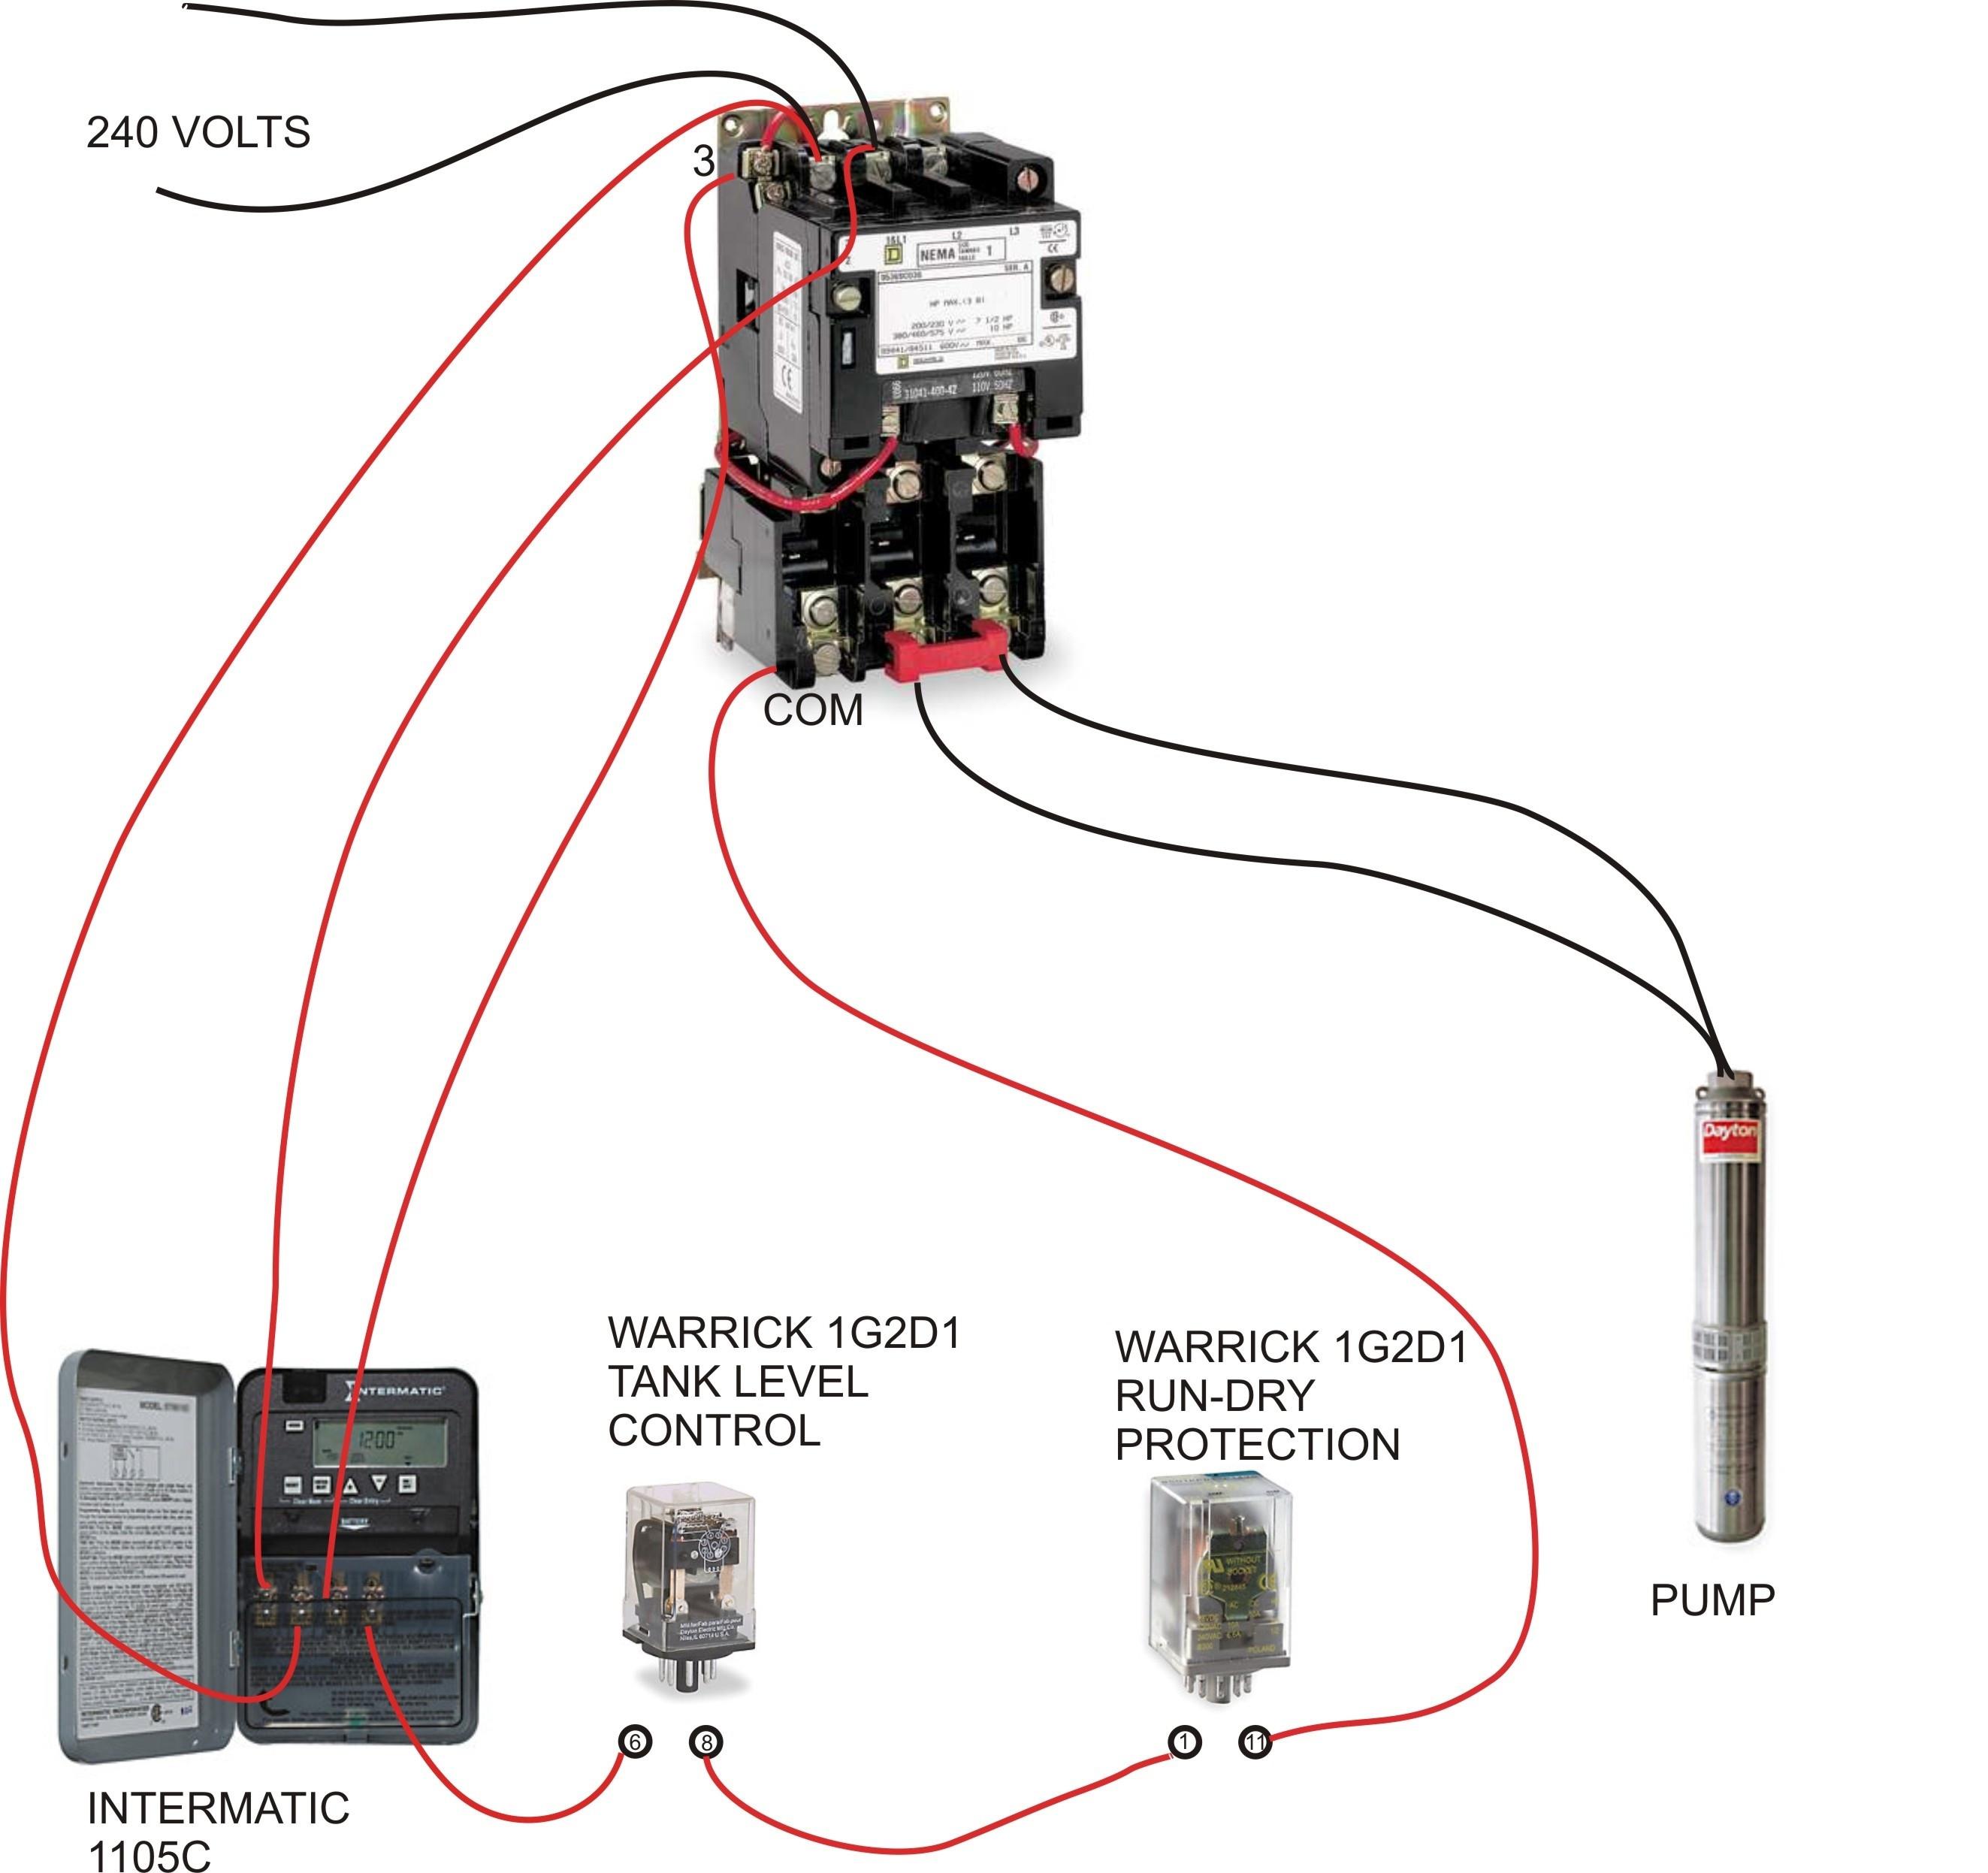 jet pump pressure switch wiring diagram Download-Wiring Diagram for Pressure Switch Inspirationa Well Pump Pressure Switch Wiring Diagram Wiring Diagram 11-l